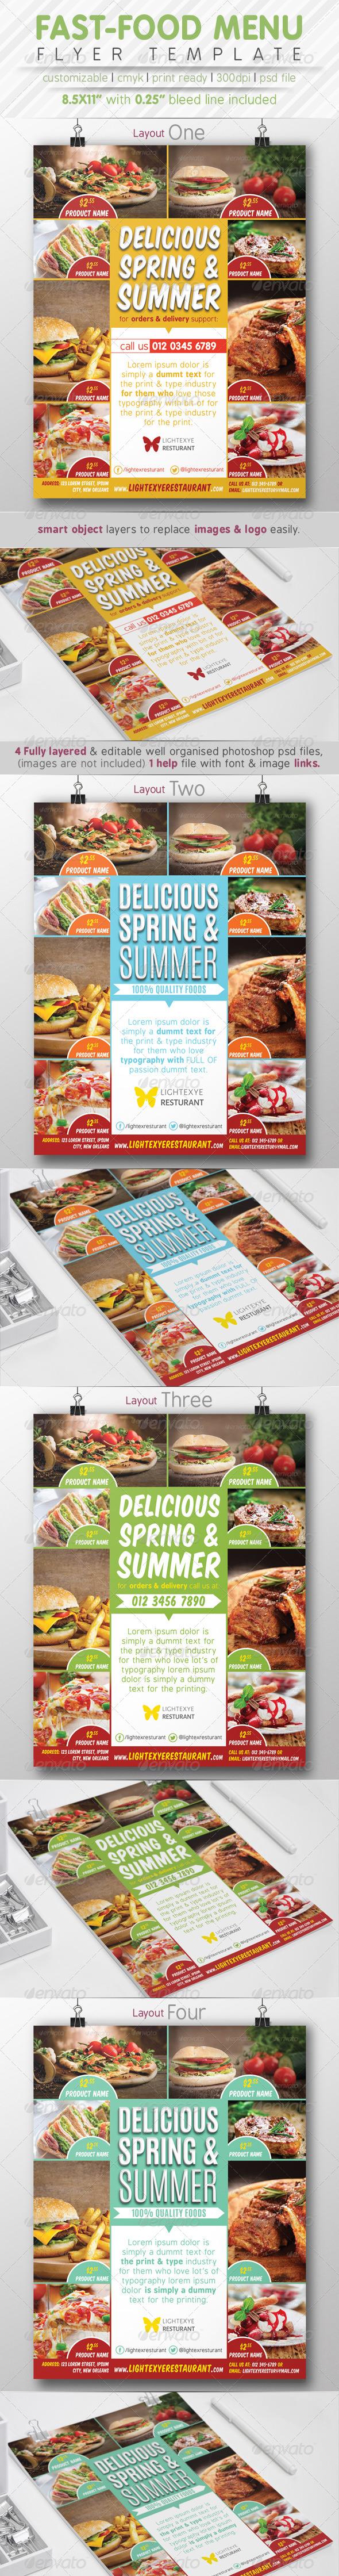 GraphicRiver Fast Food Menu Flyer Ads 7841249